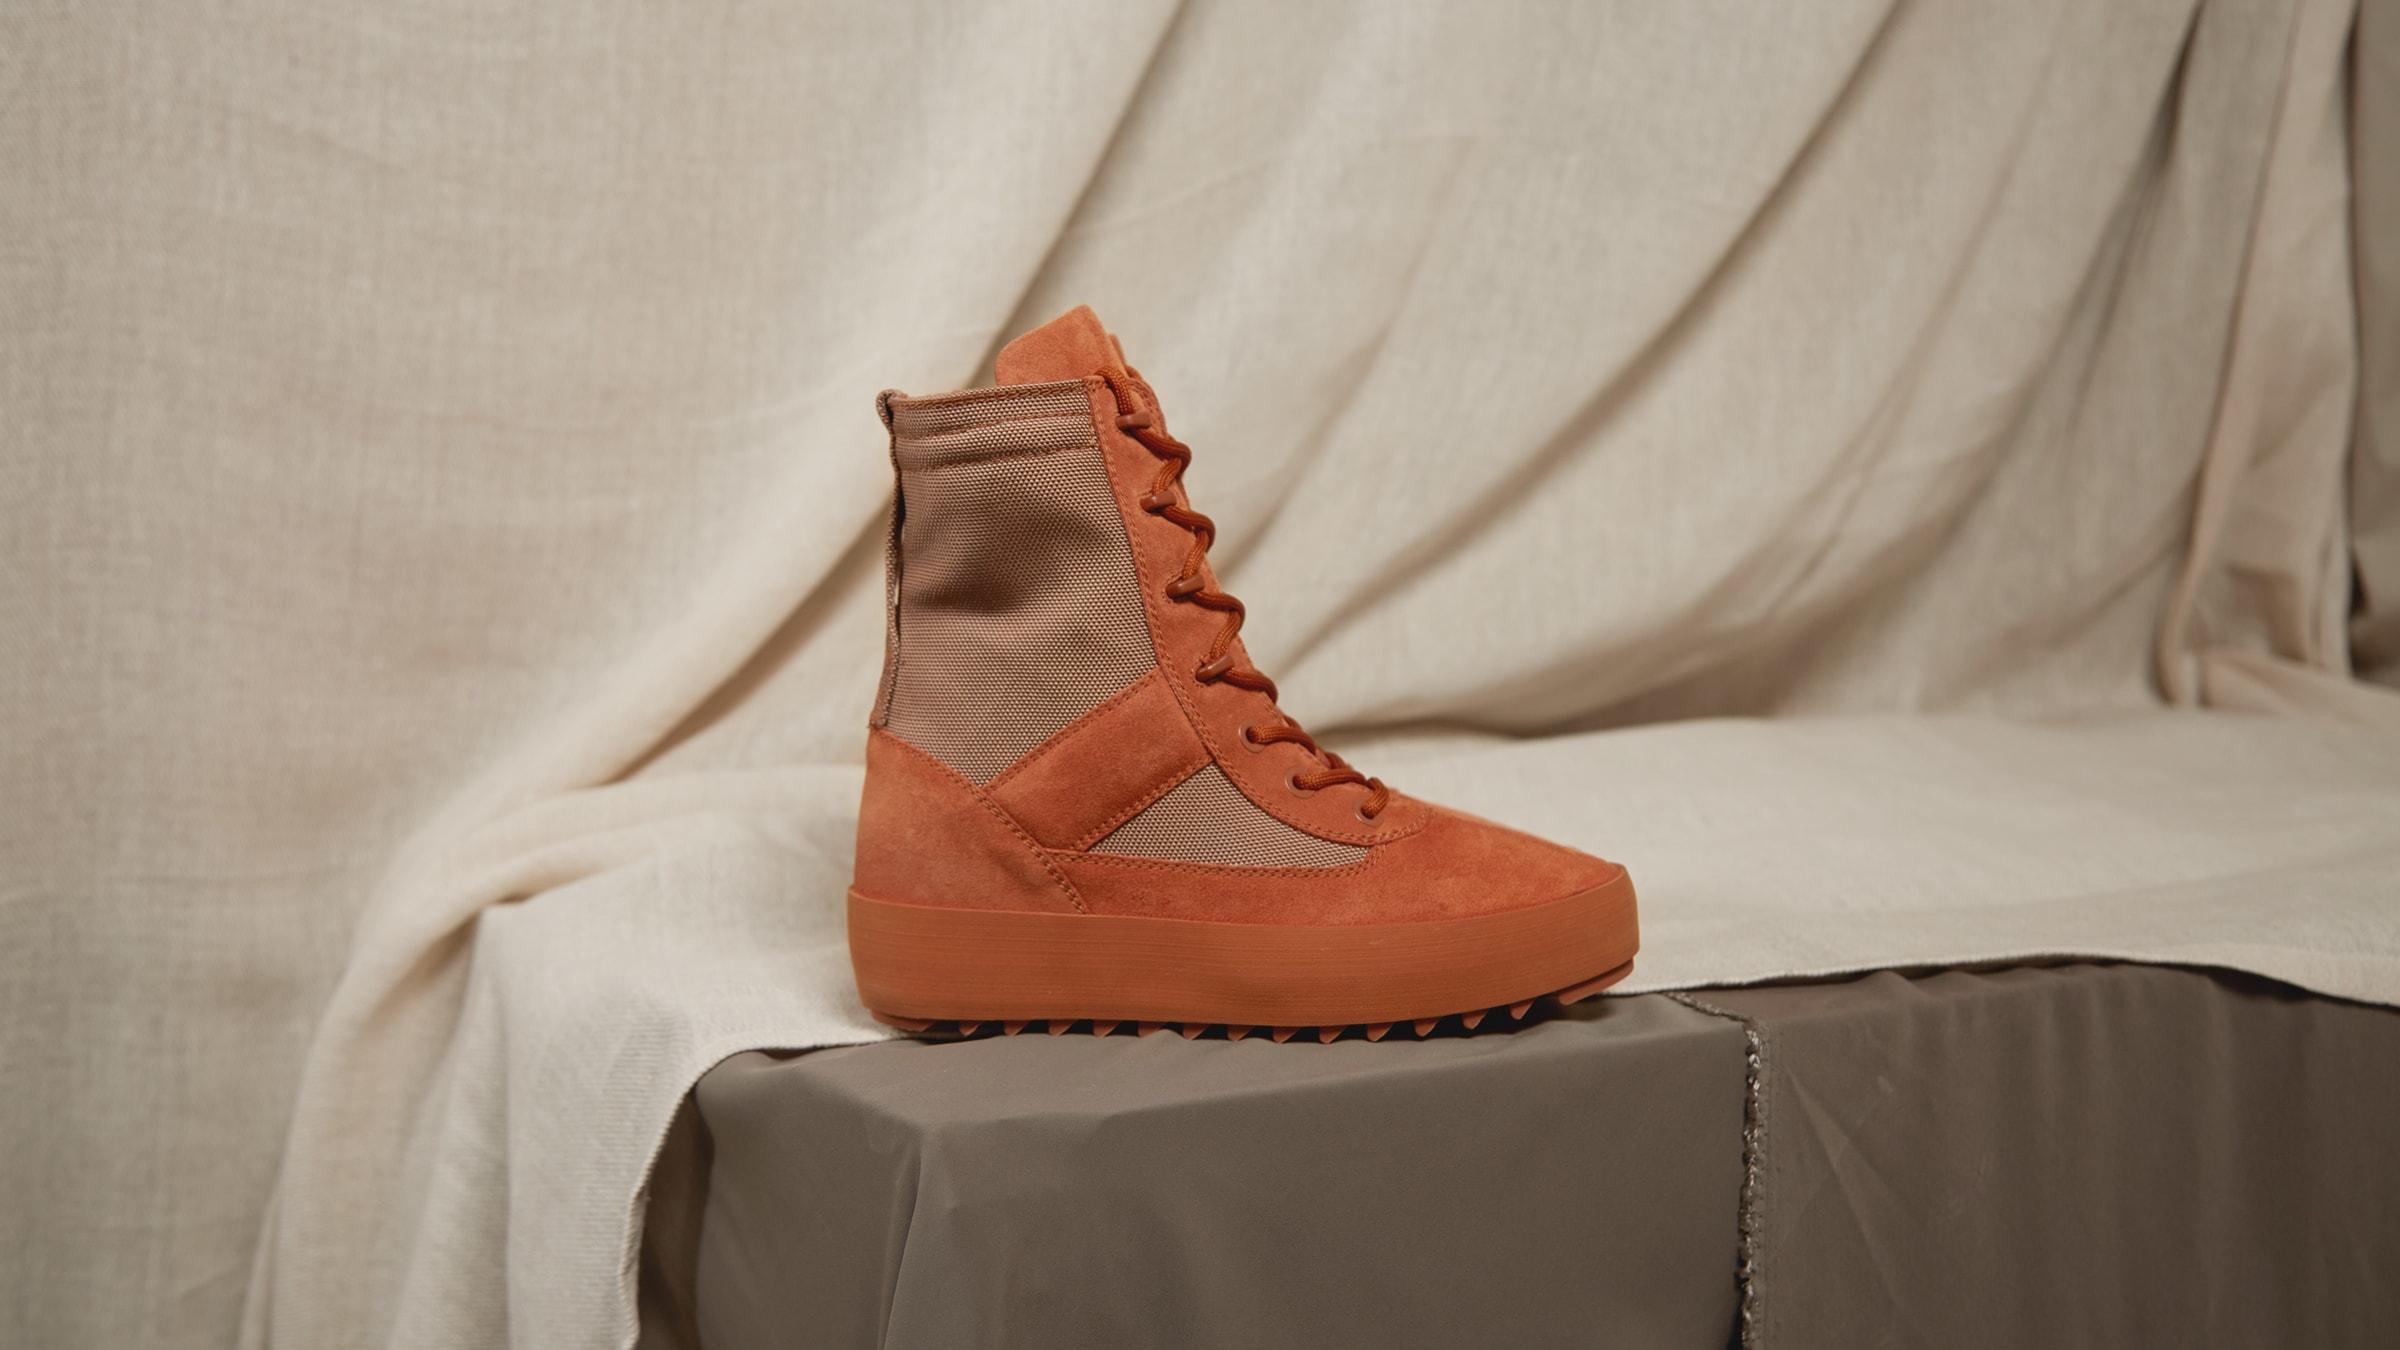 fcfeeed529b9e Yeezy Season 3 Women s Military Boot Burnt Sienna